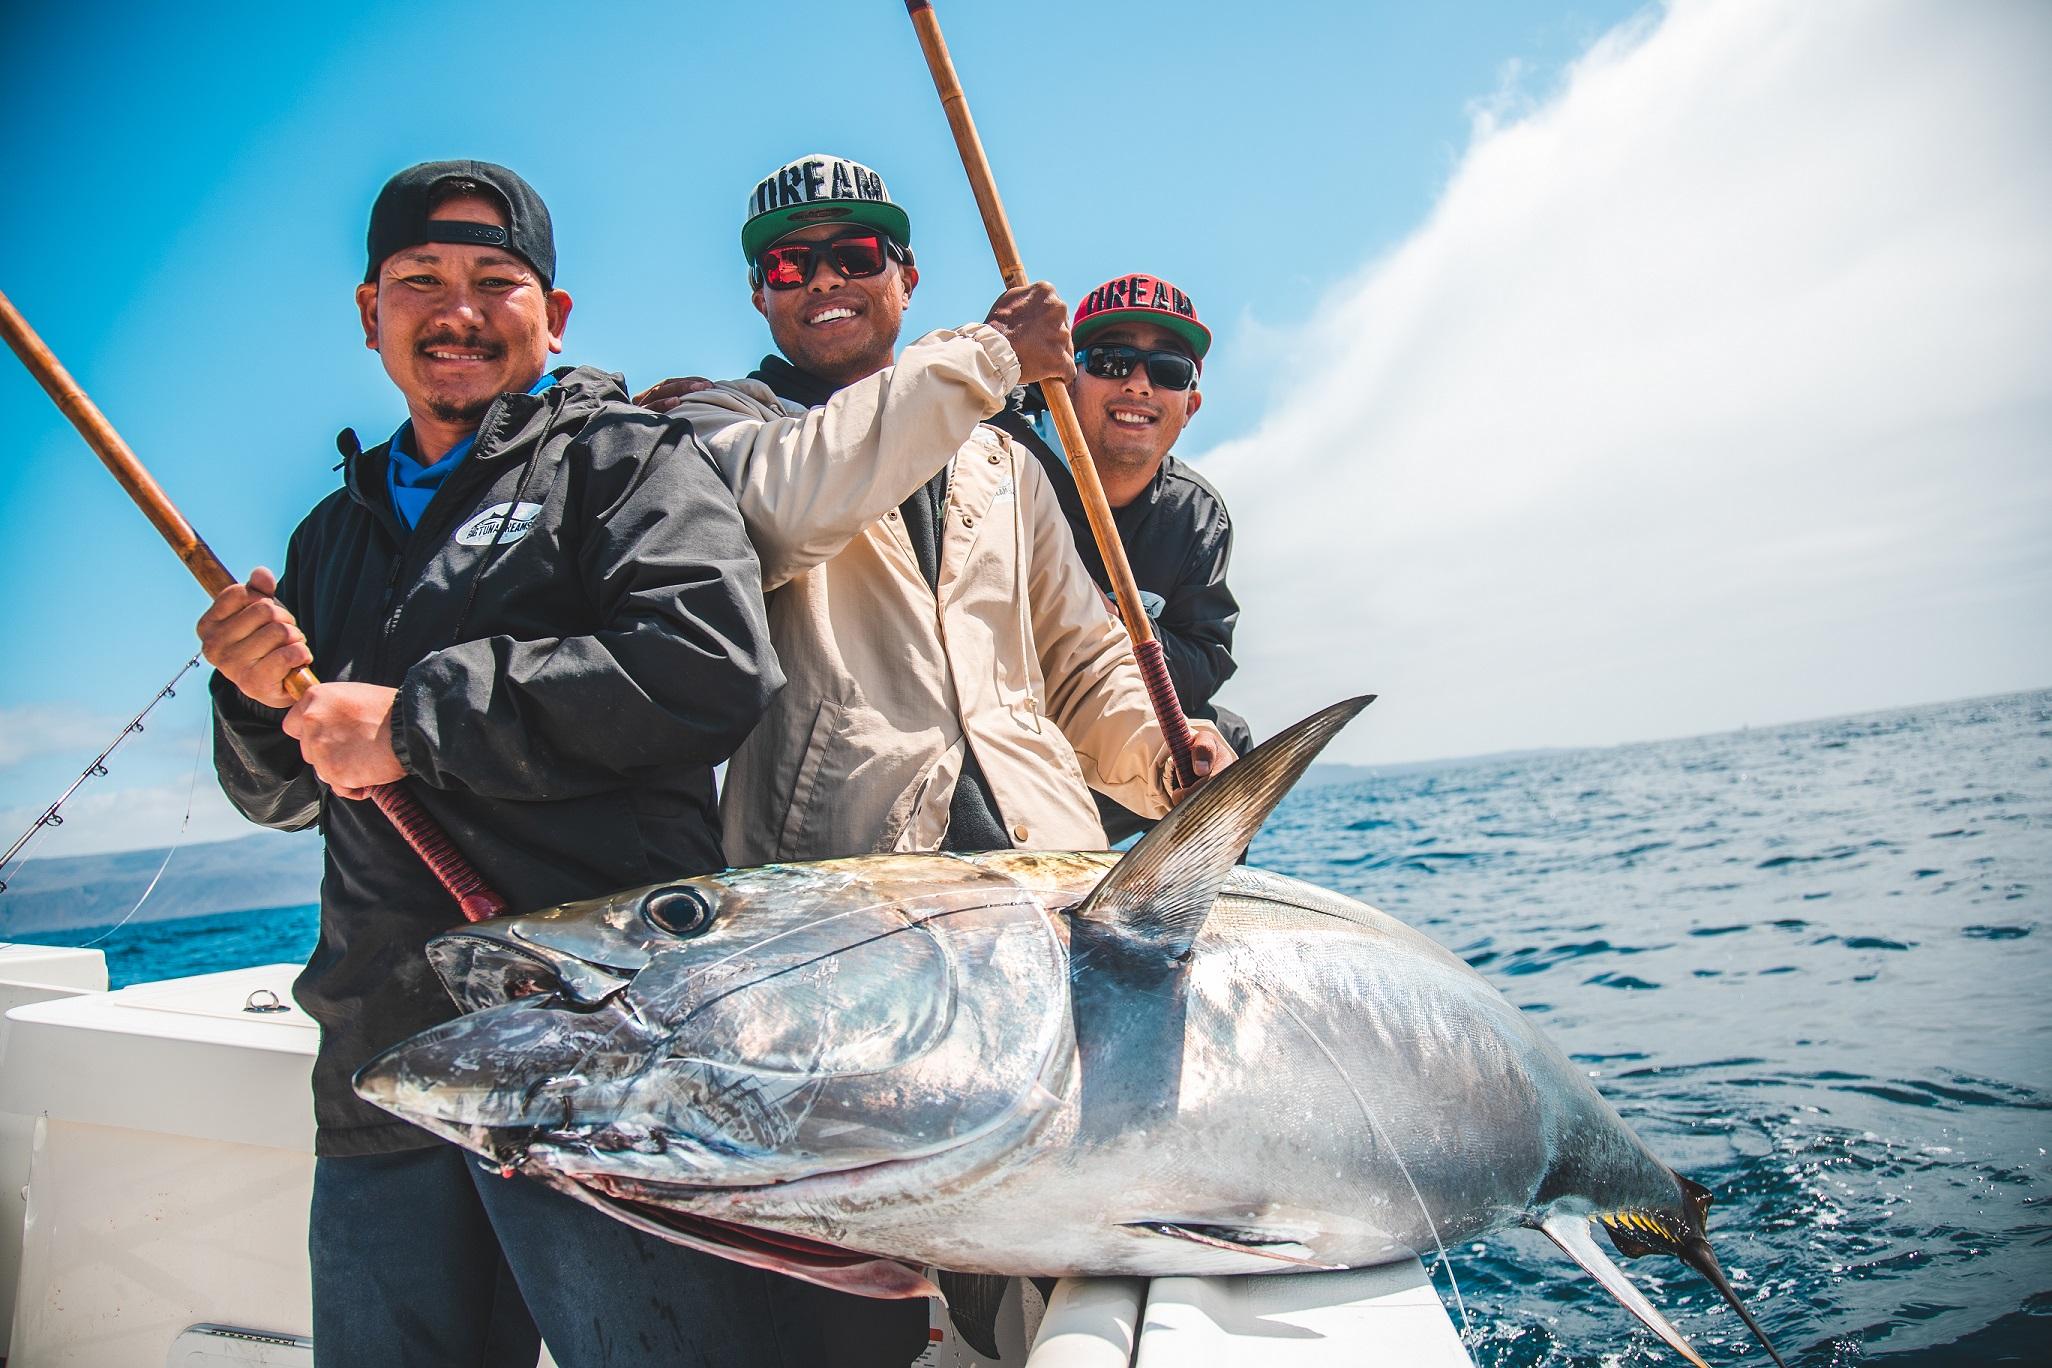 The San Diego Bluefin Tuna Makes a Comeback